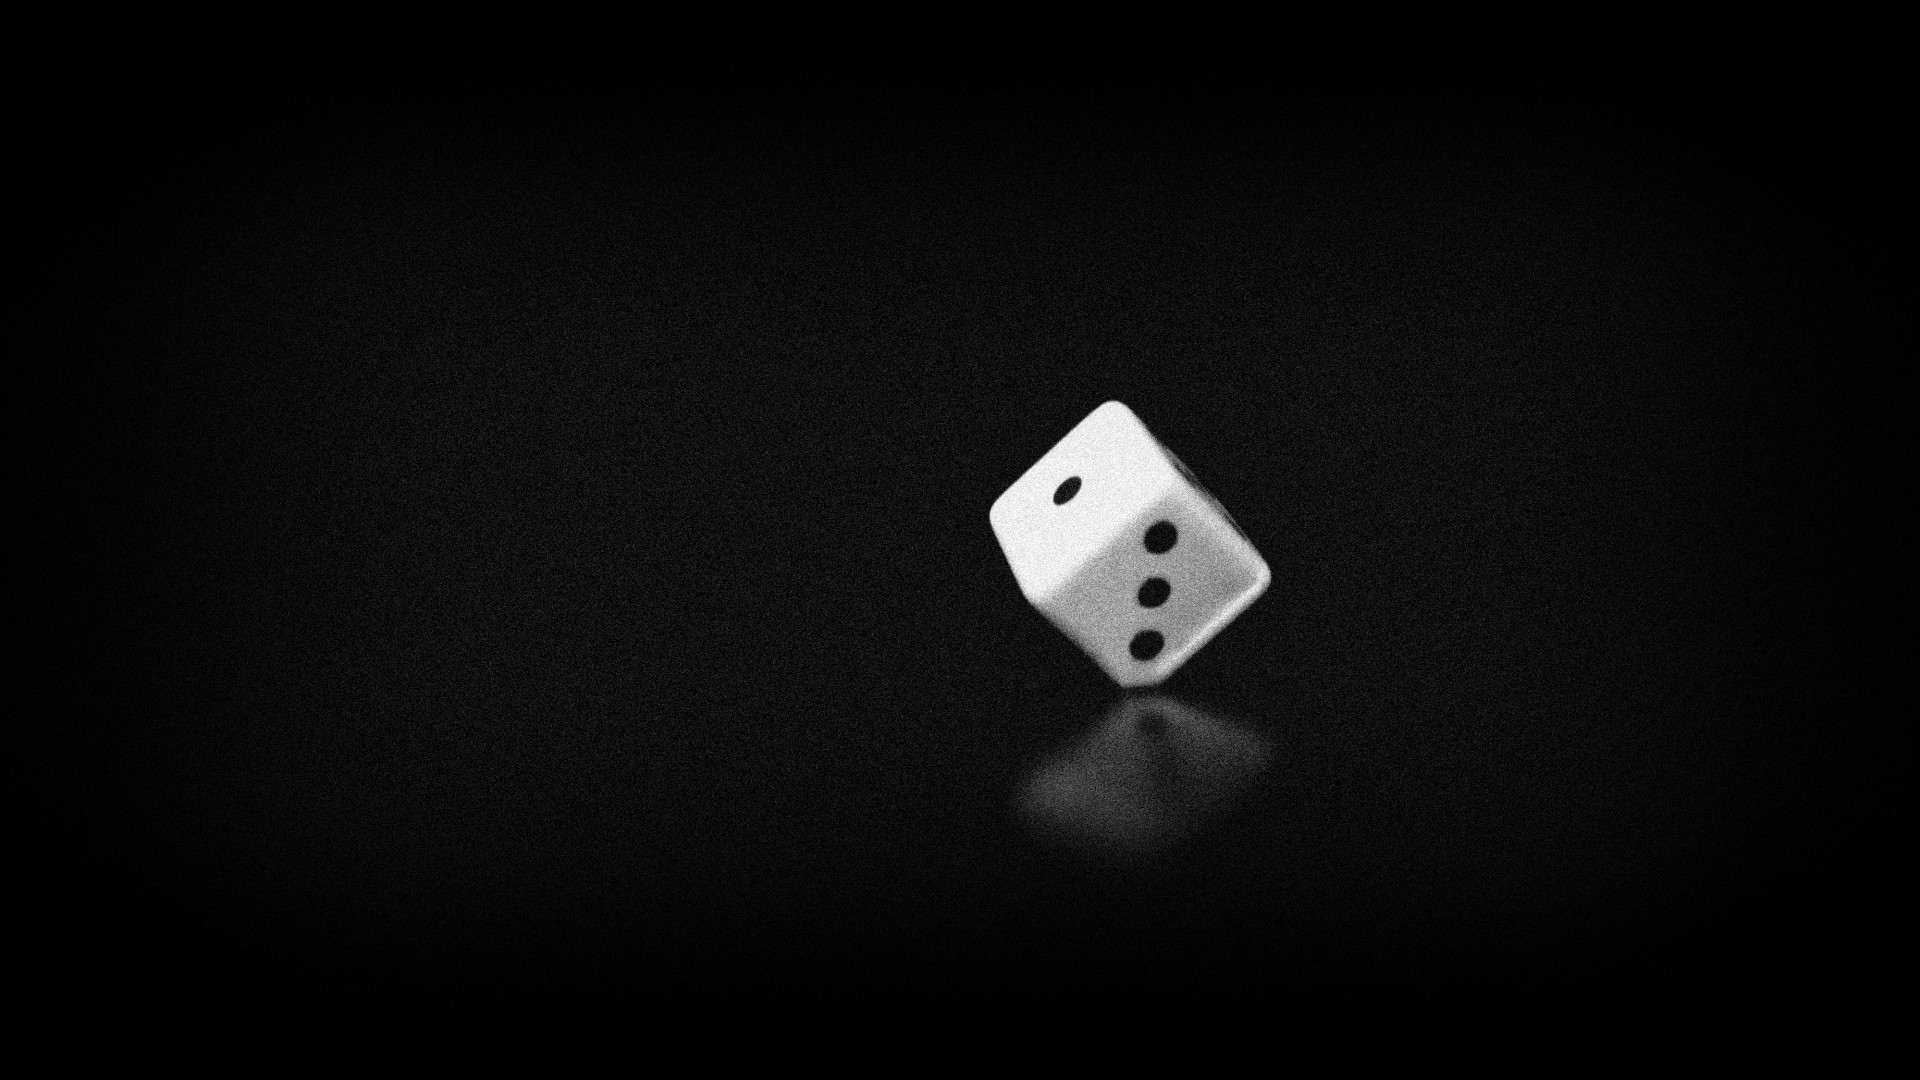 Wallpaper black, black white, bone, time, game, noise